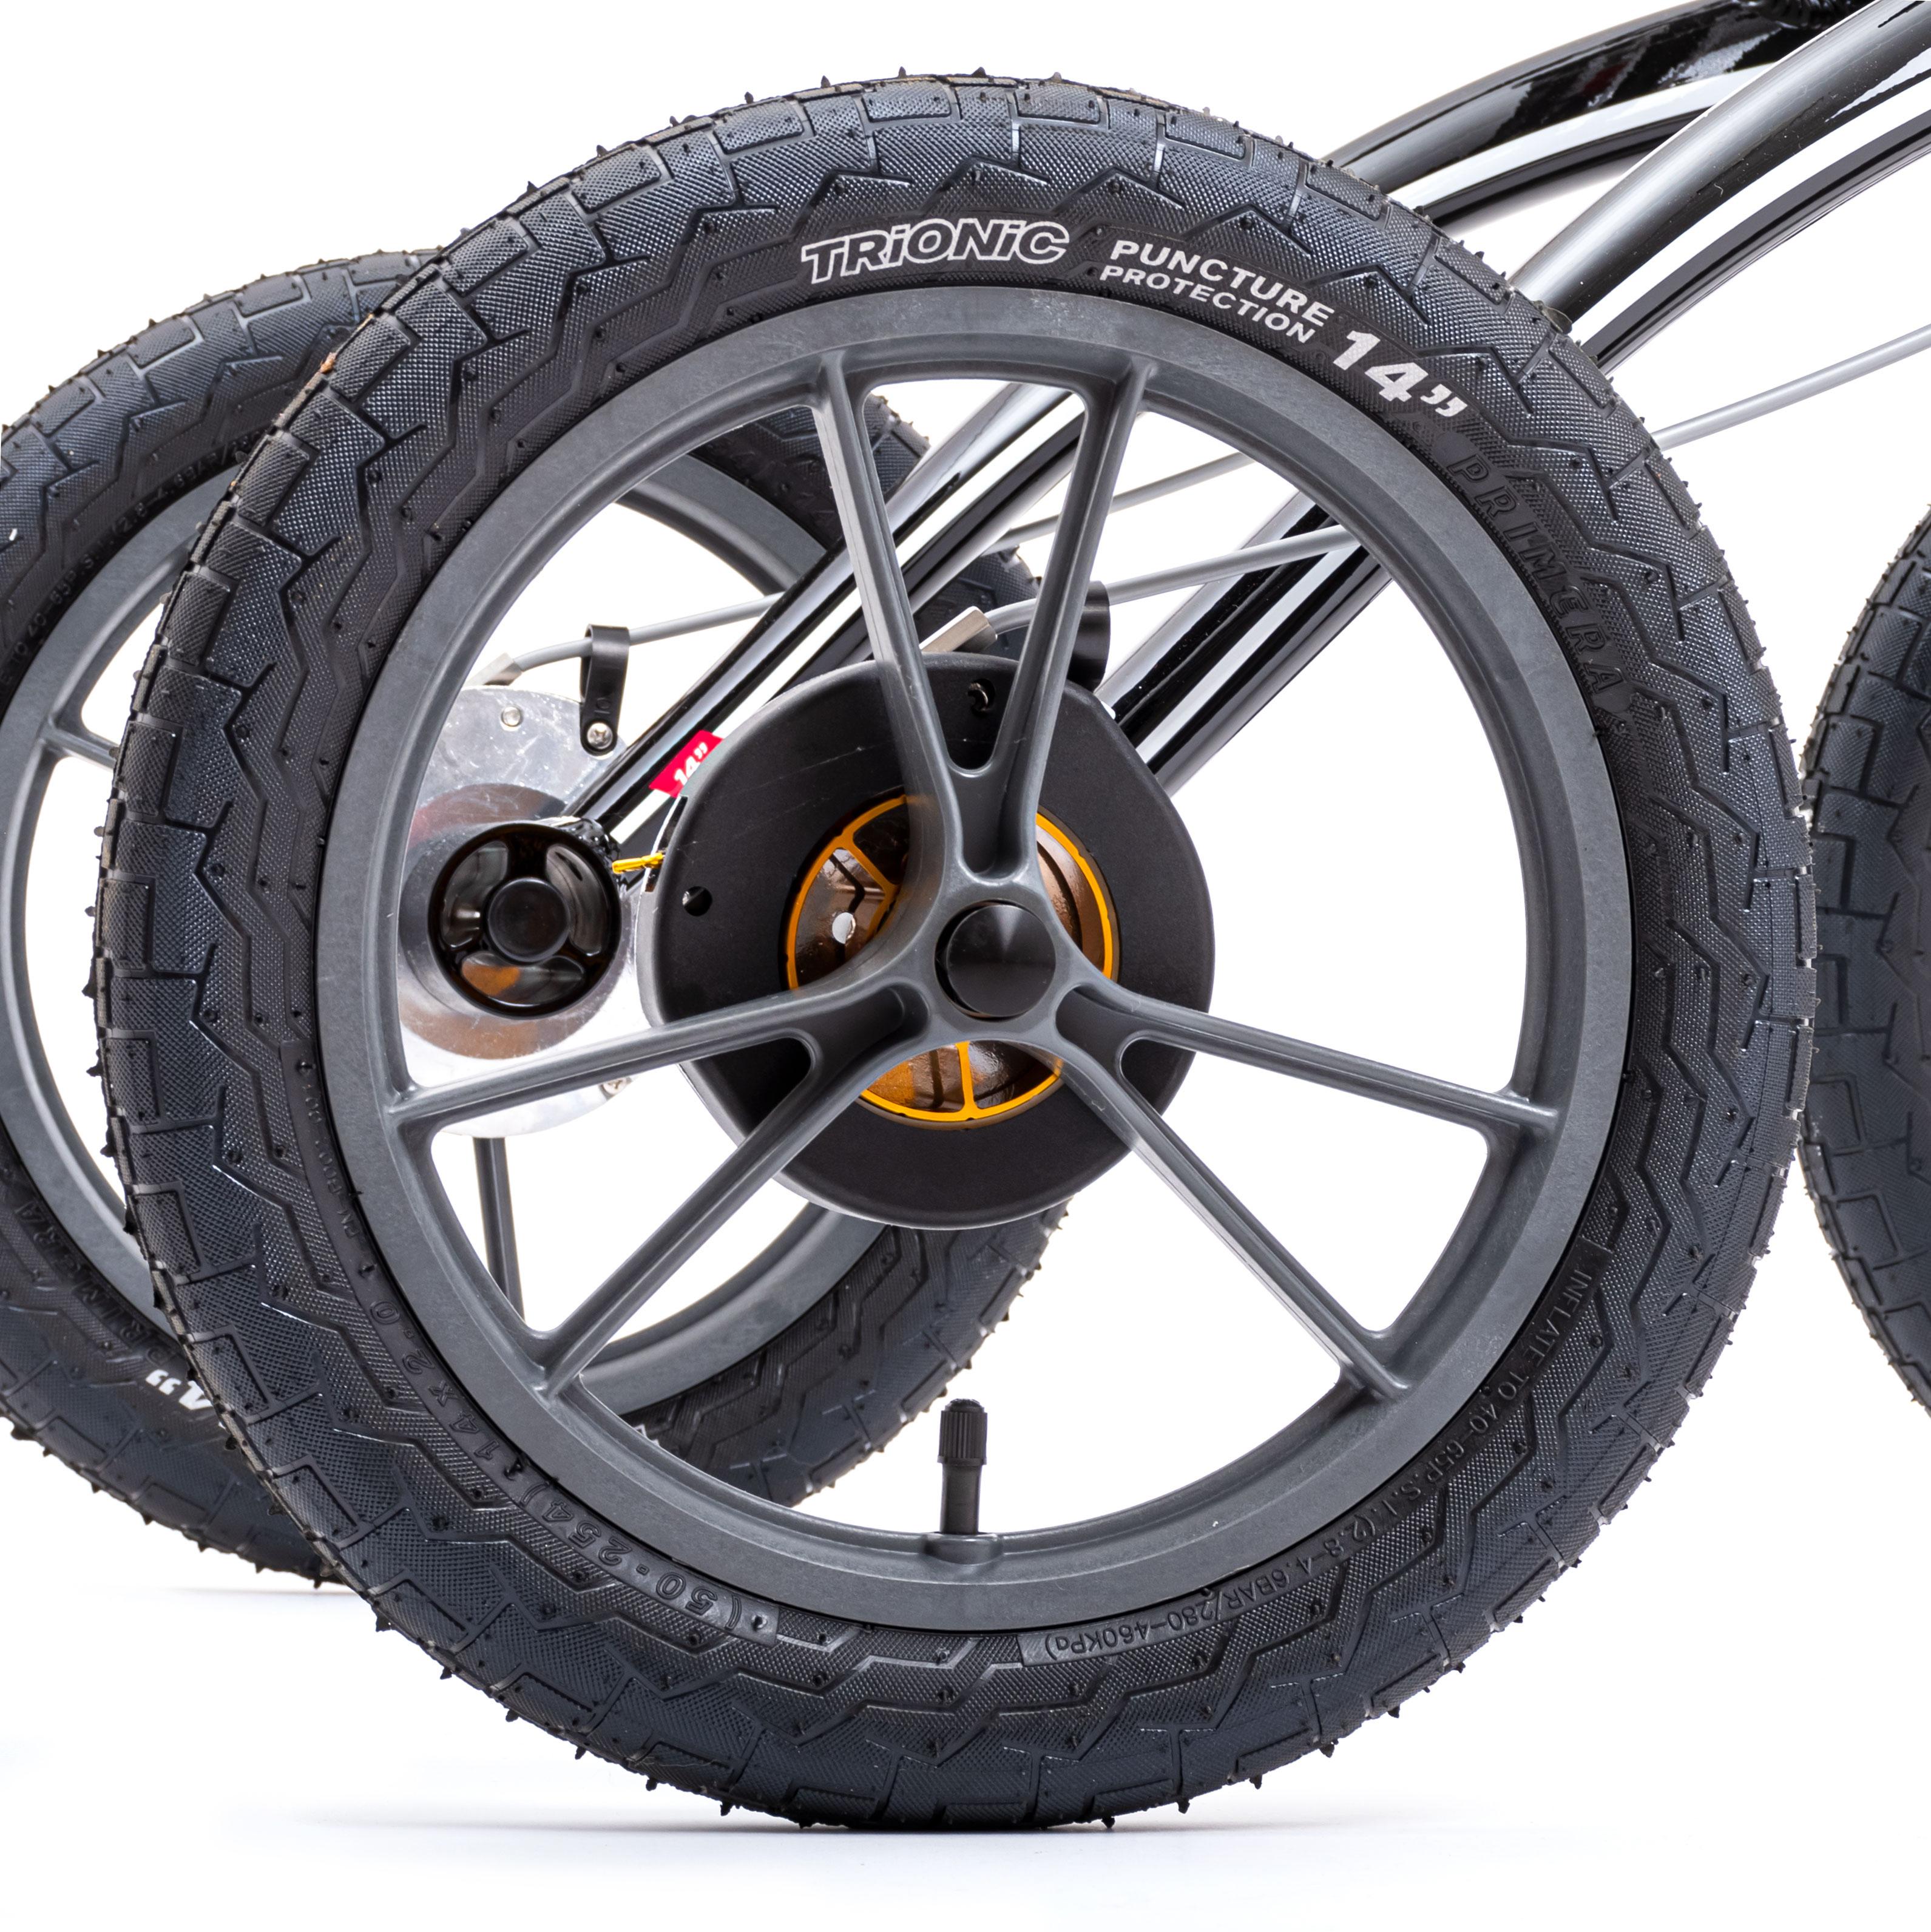 Размер колес имеет значение